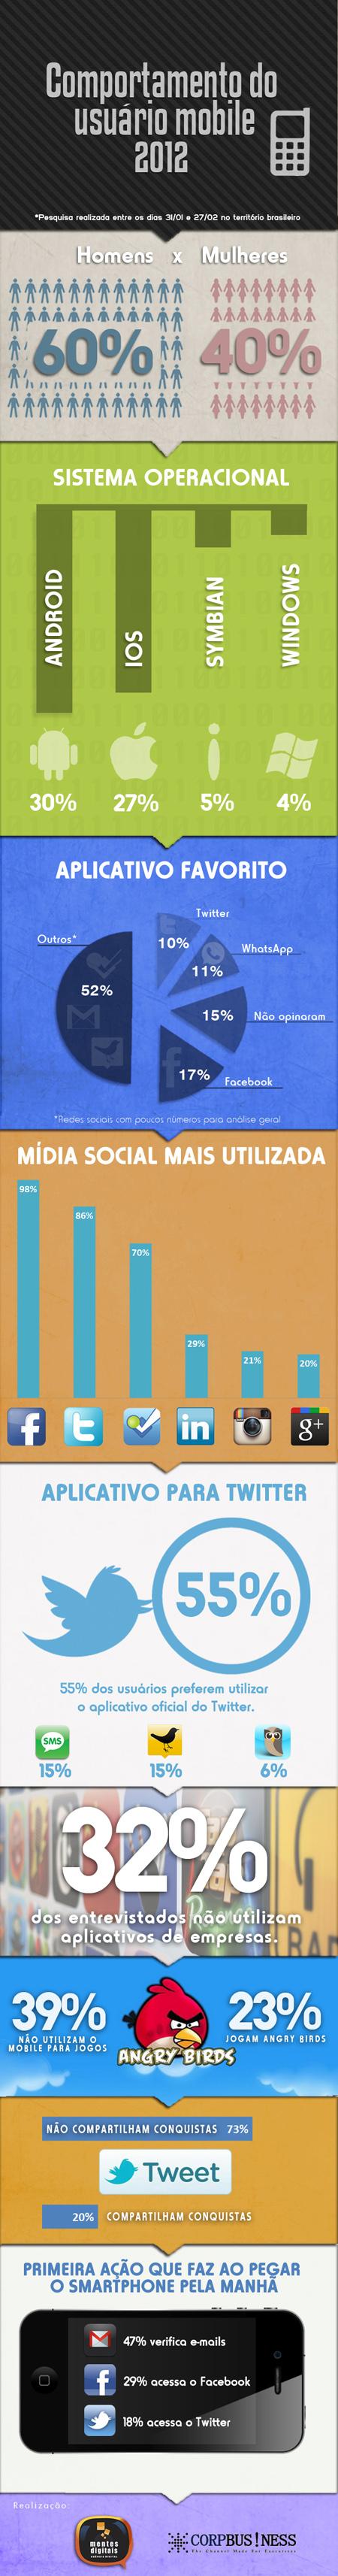 whatsapp usuario twitter tecnologia mobile ios instagram infográfico gmail facebook comportamento celular Angry Birds android 2012